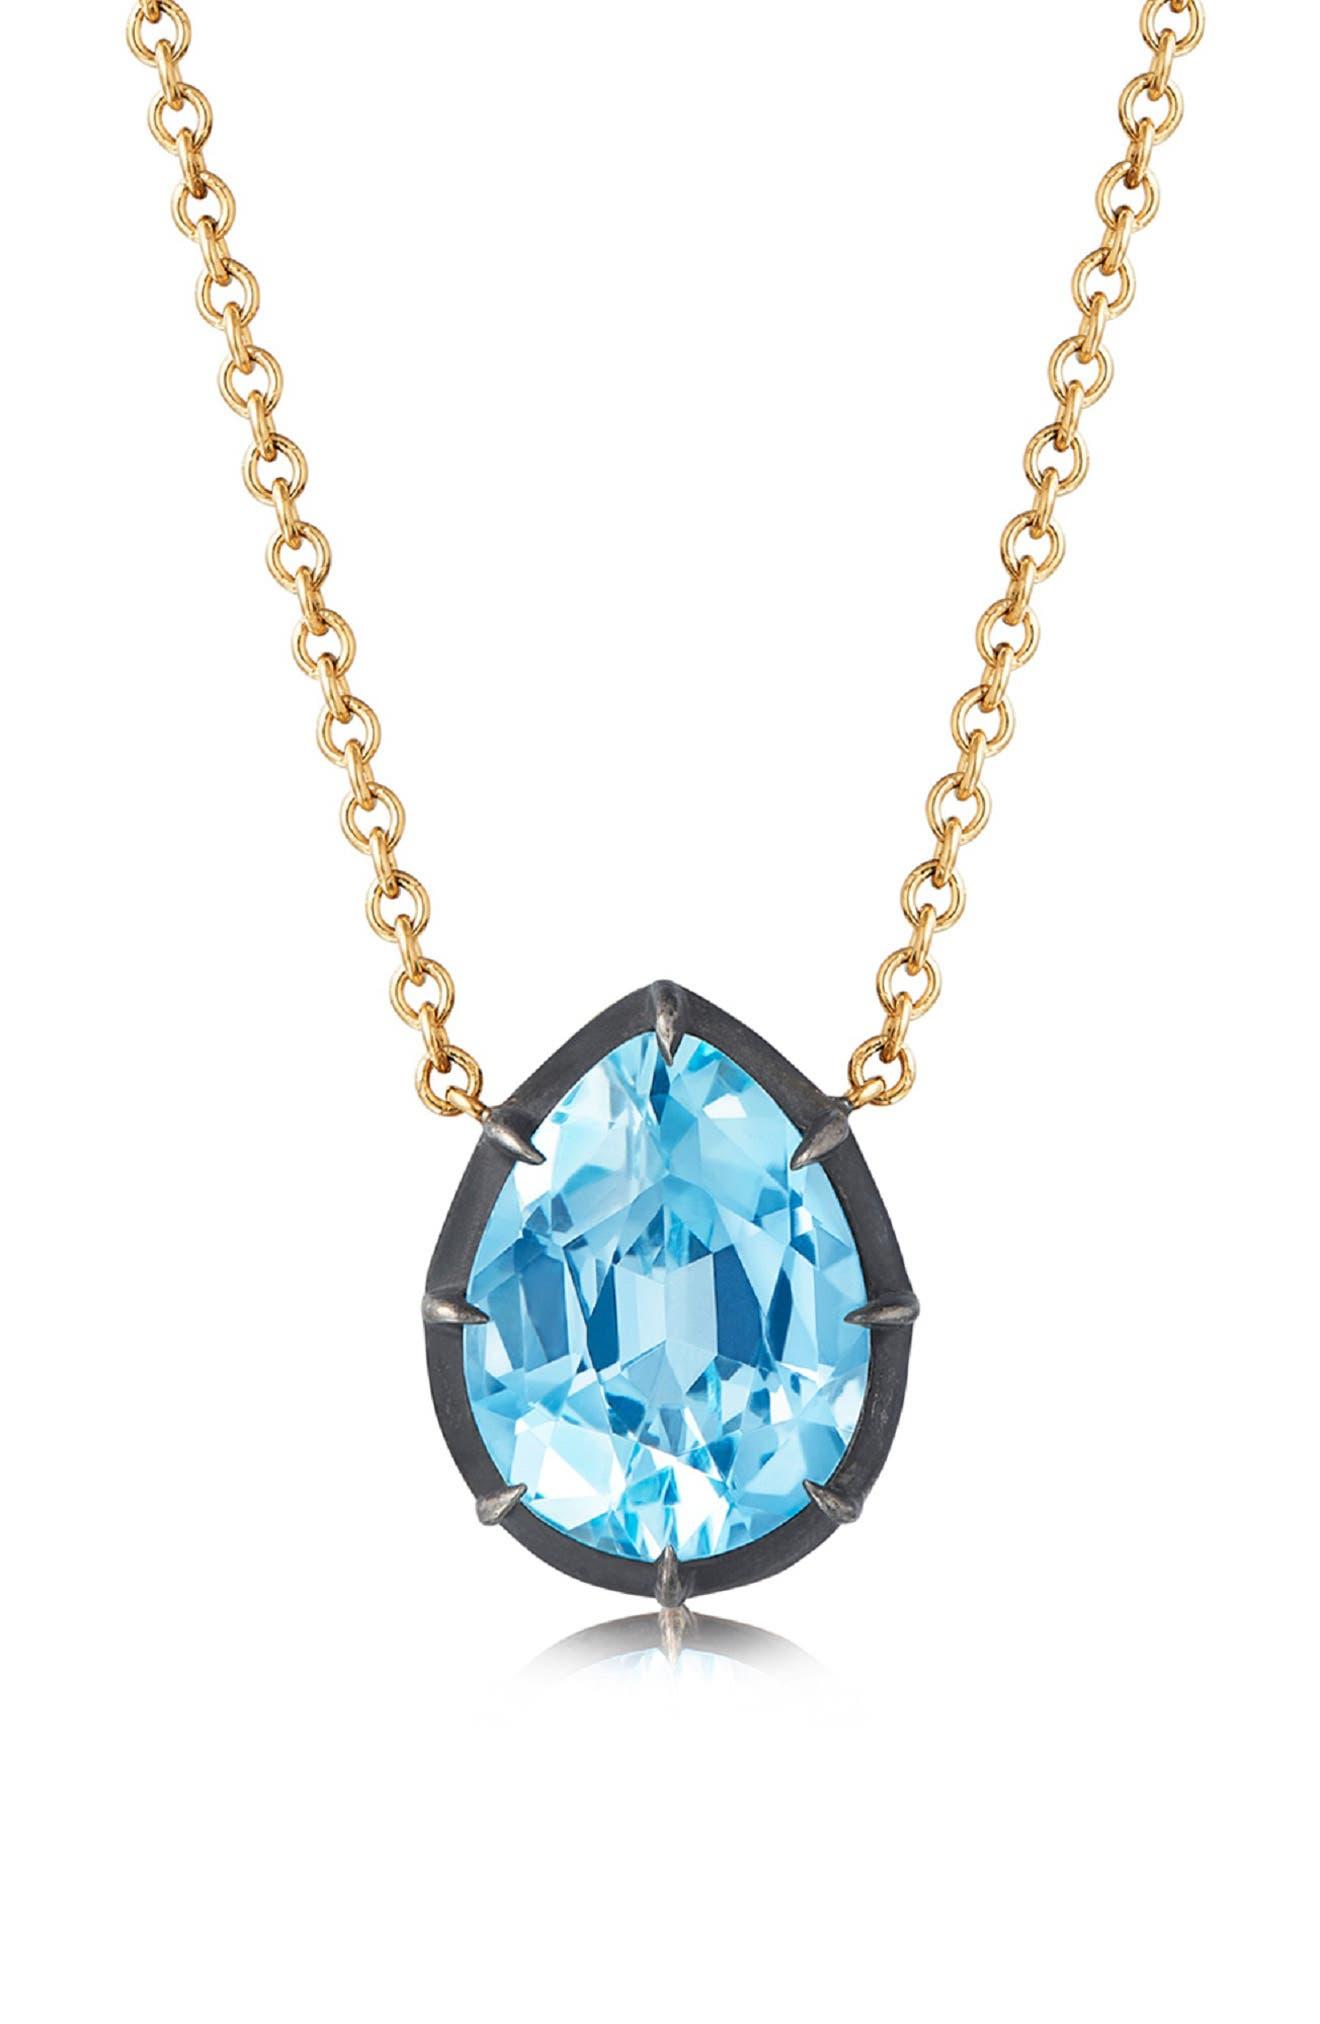 Collet Teardrop Stone Pendant Necklace